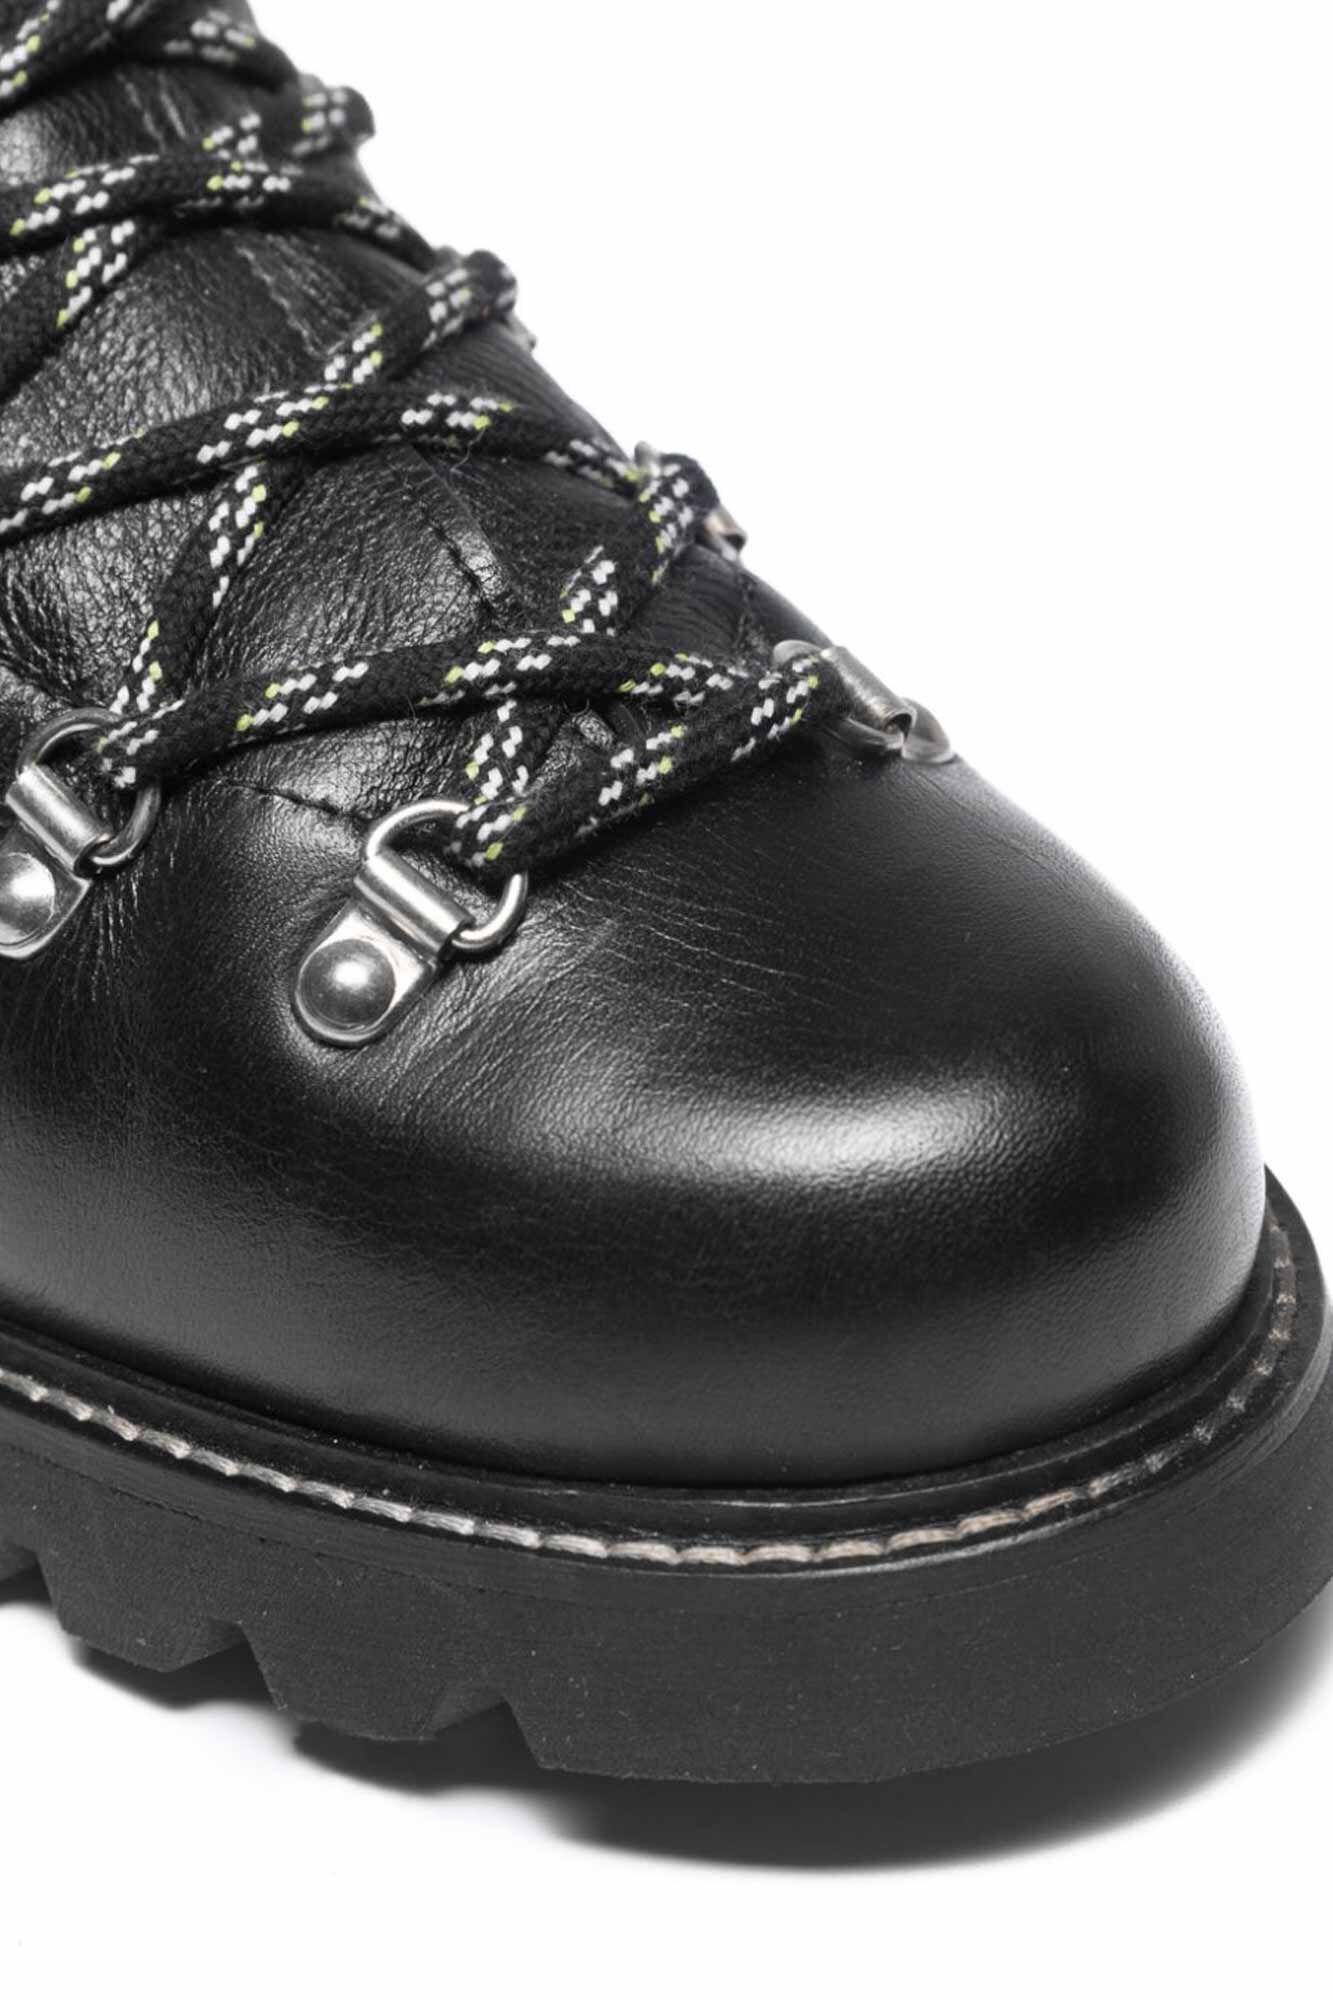 Benny boot 11930502-9947